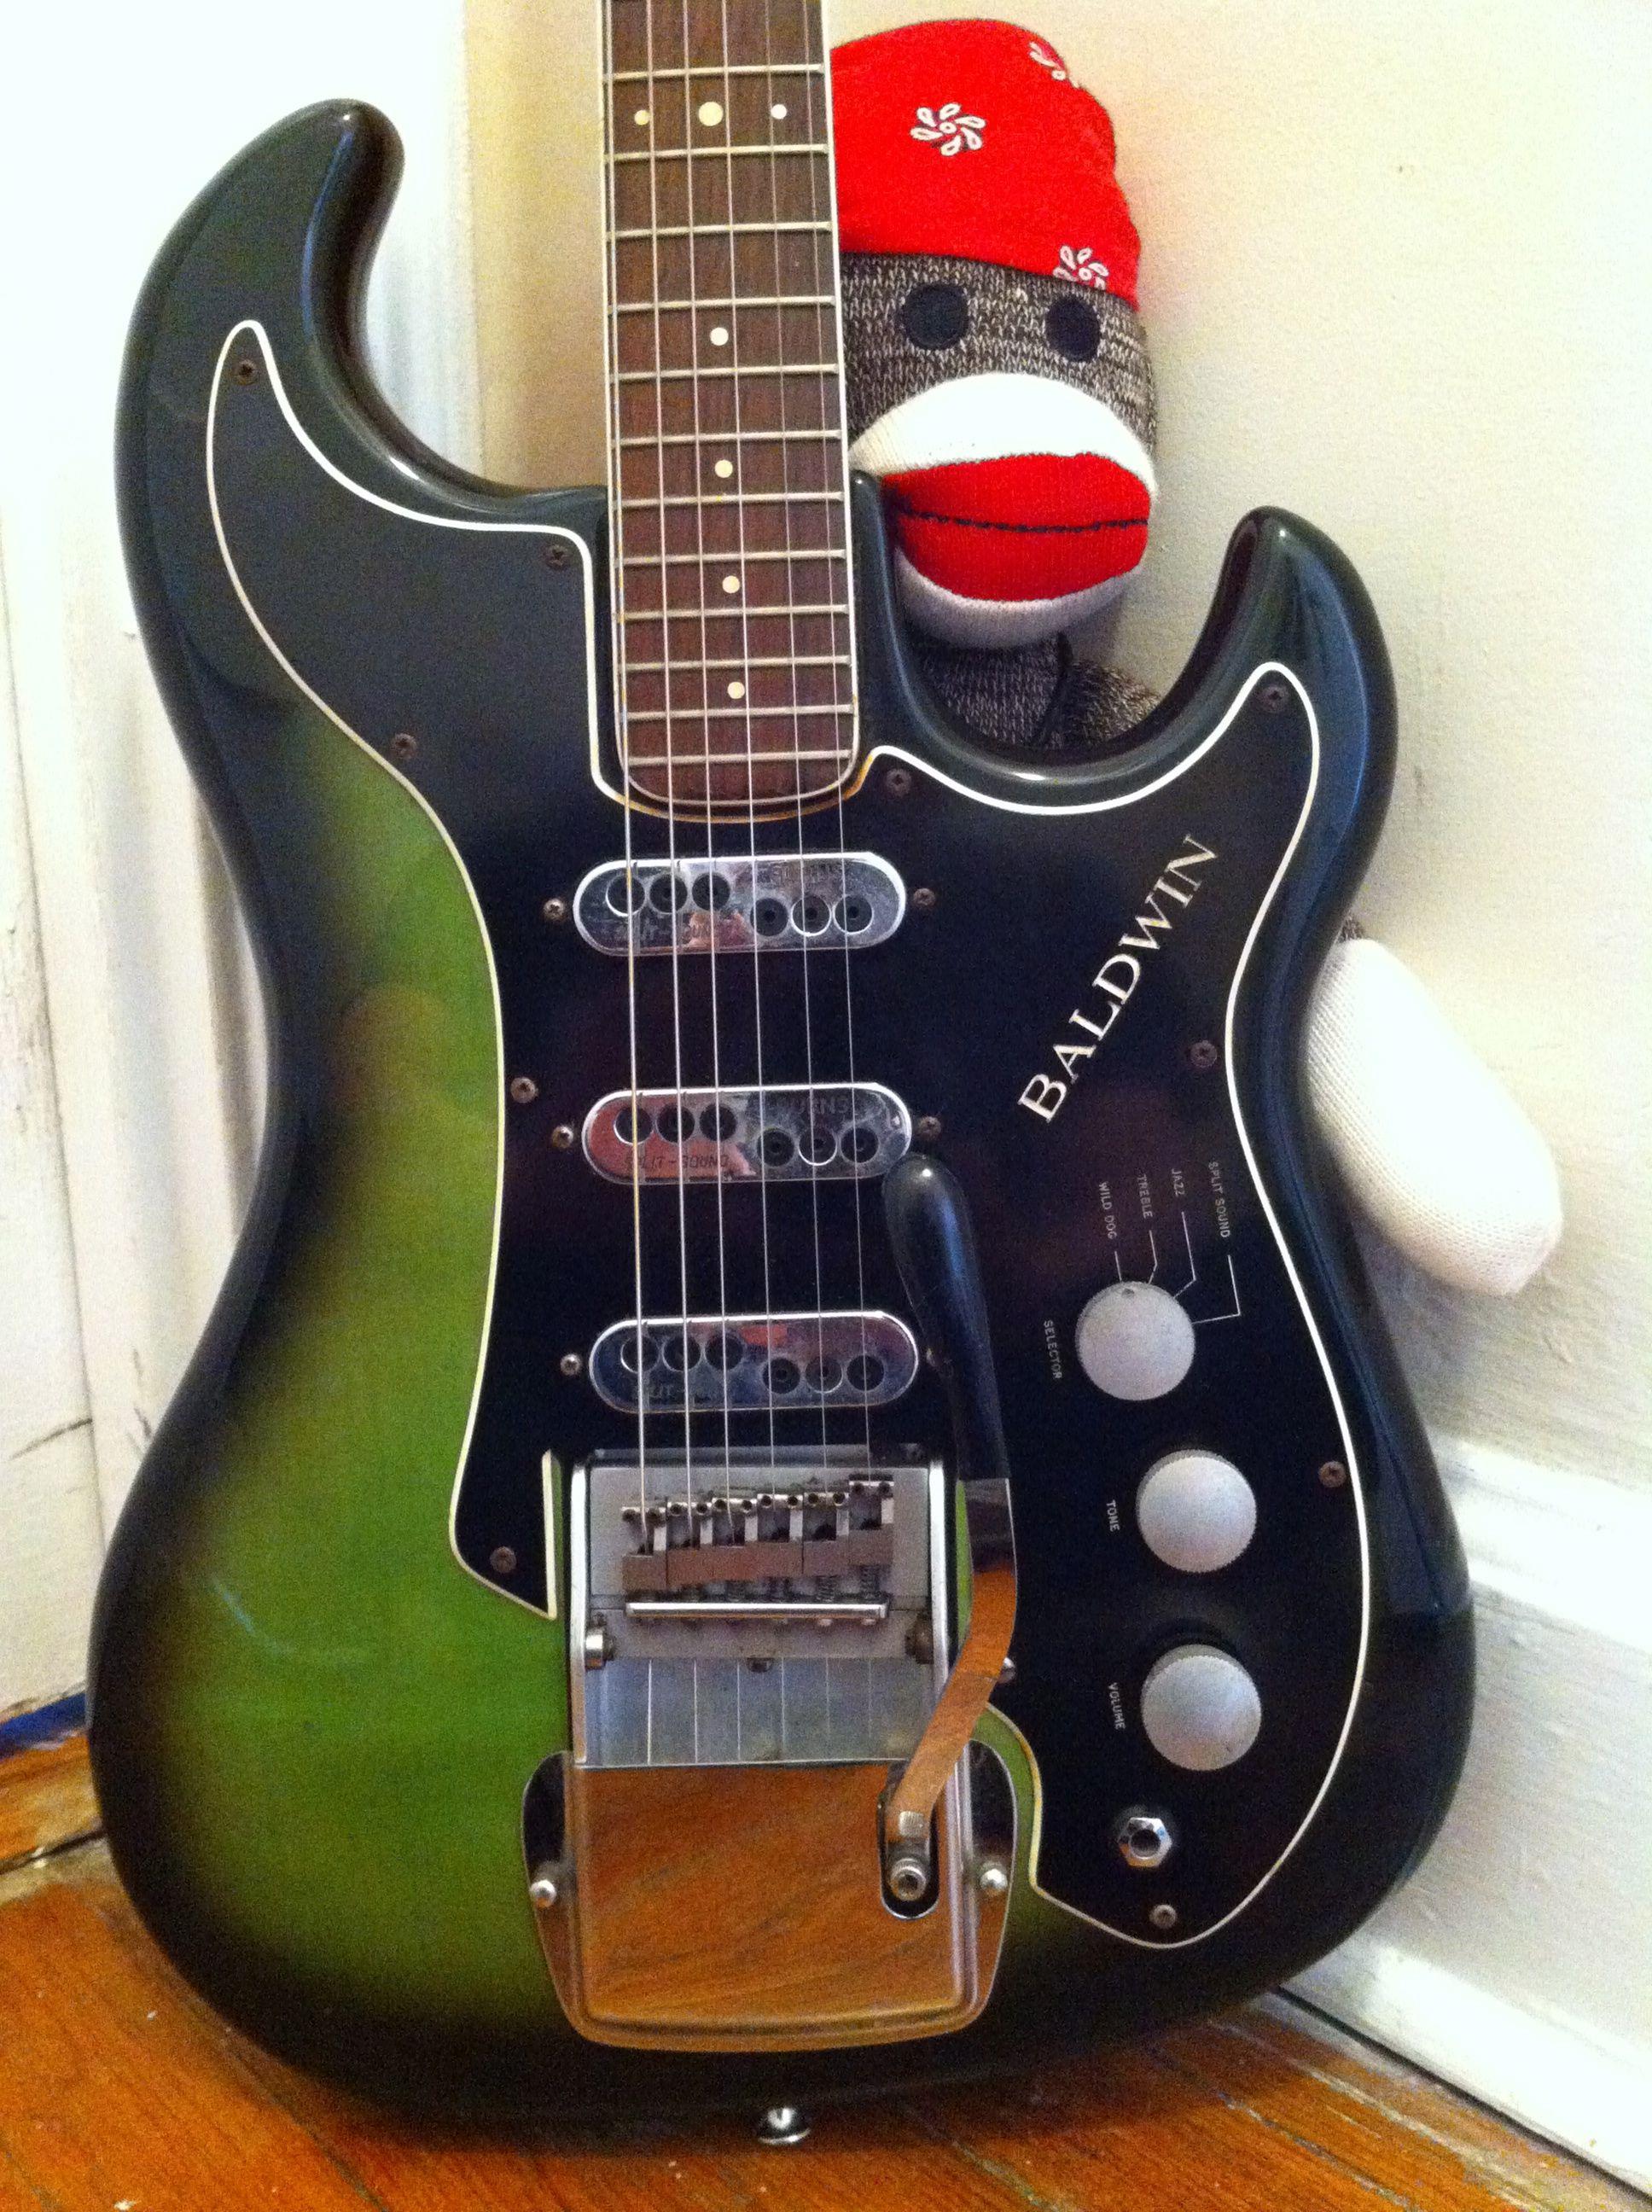 Baldwin bass fetish guitars